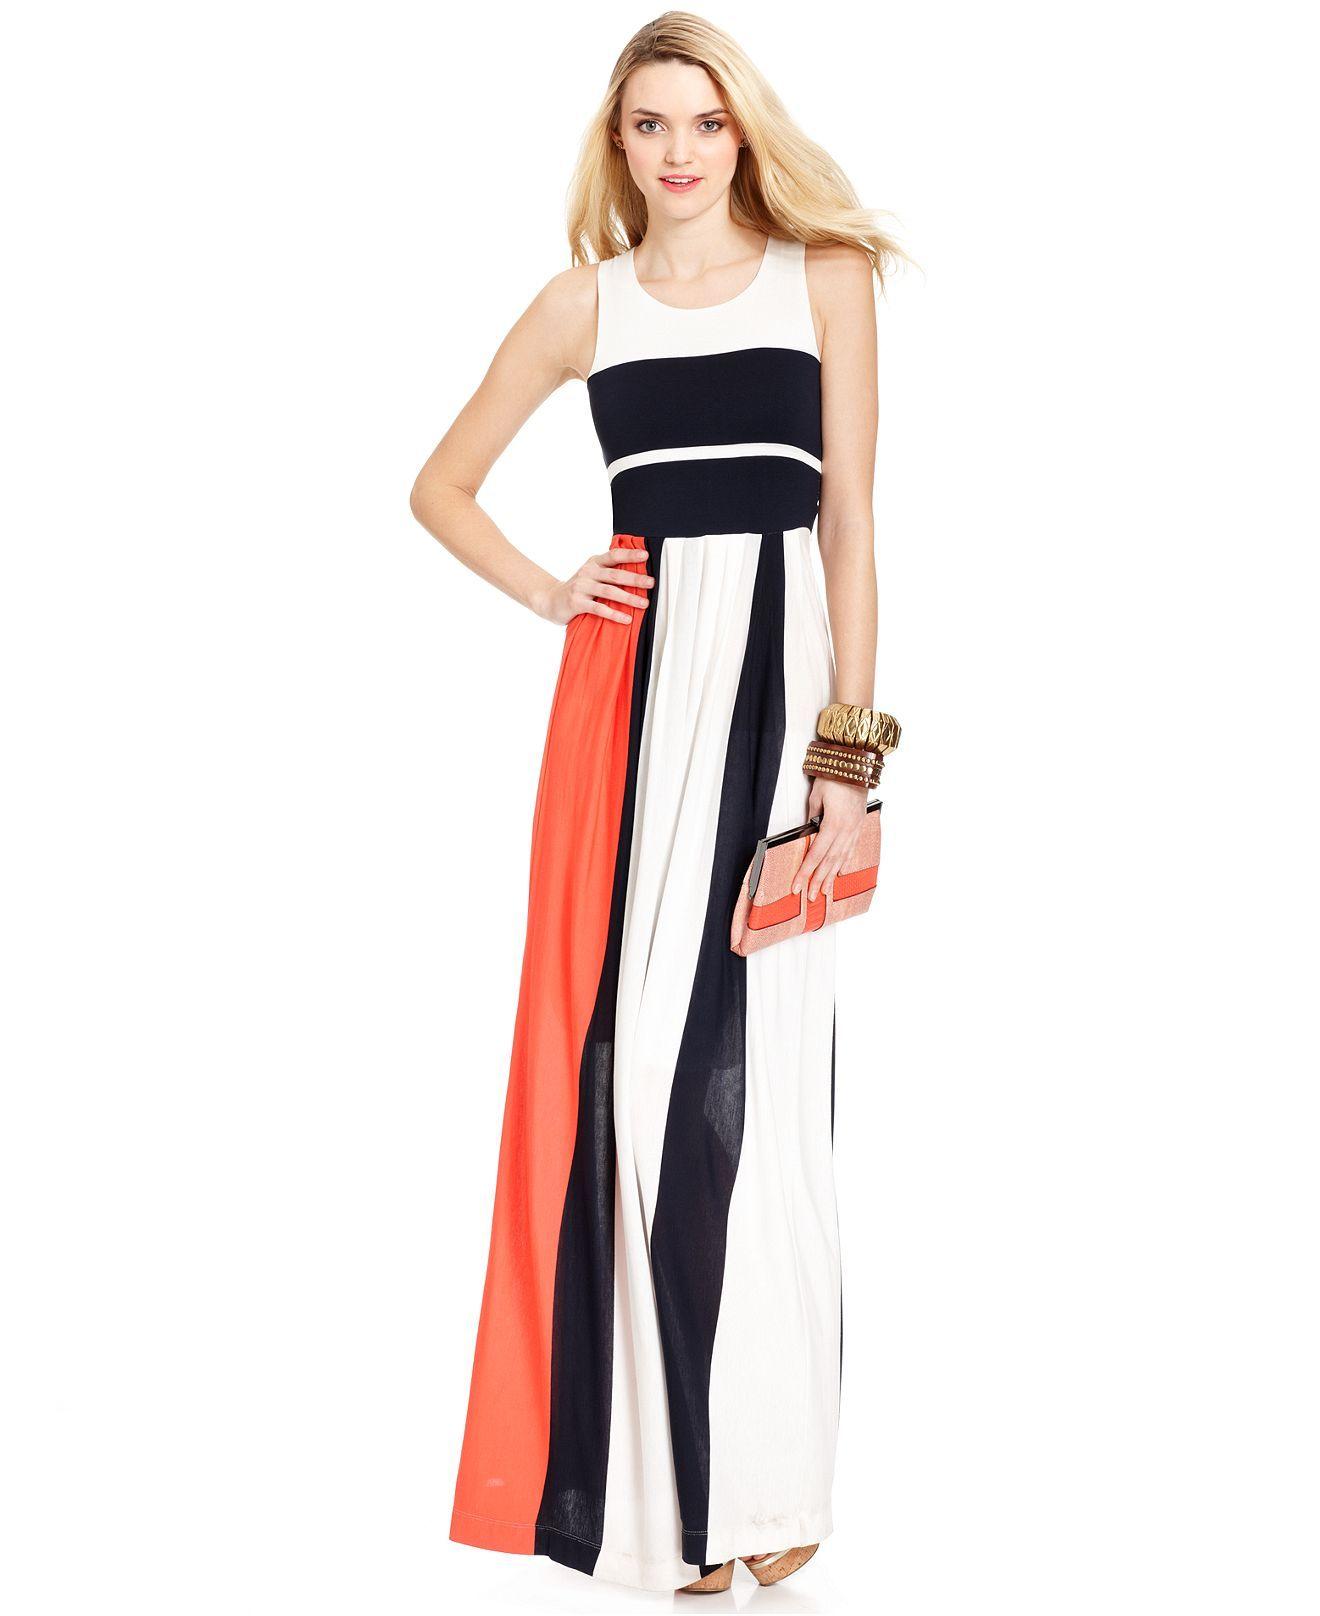 French connection dress medina sleeveless colorblock maxi womens